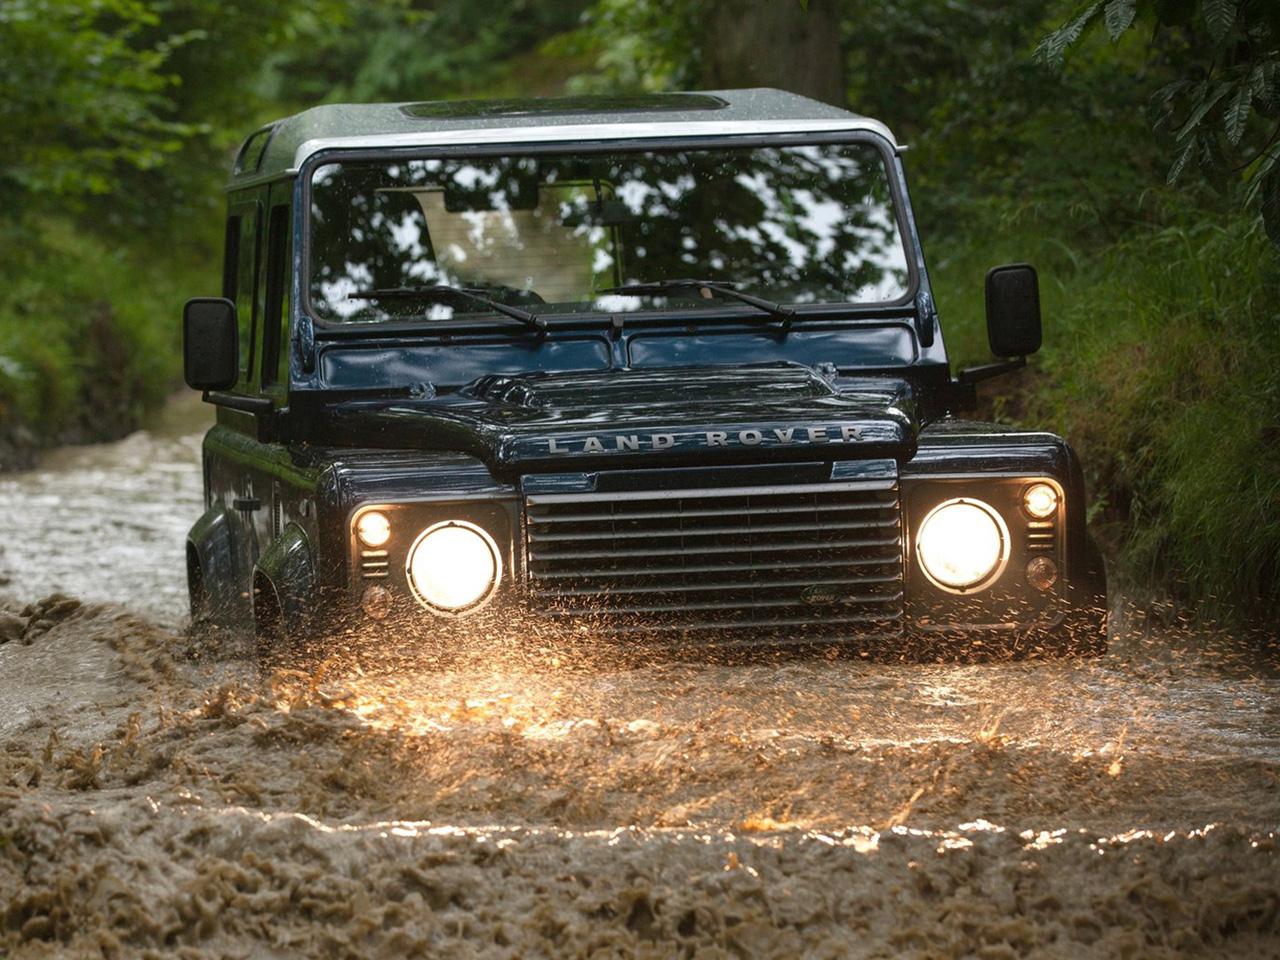 Frontal Land Rover Defender 90